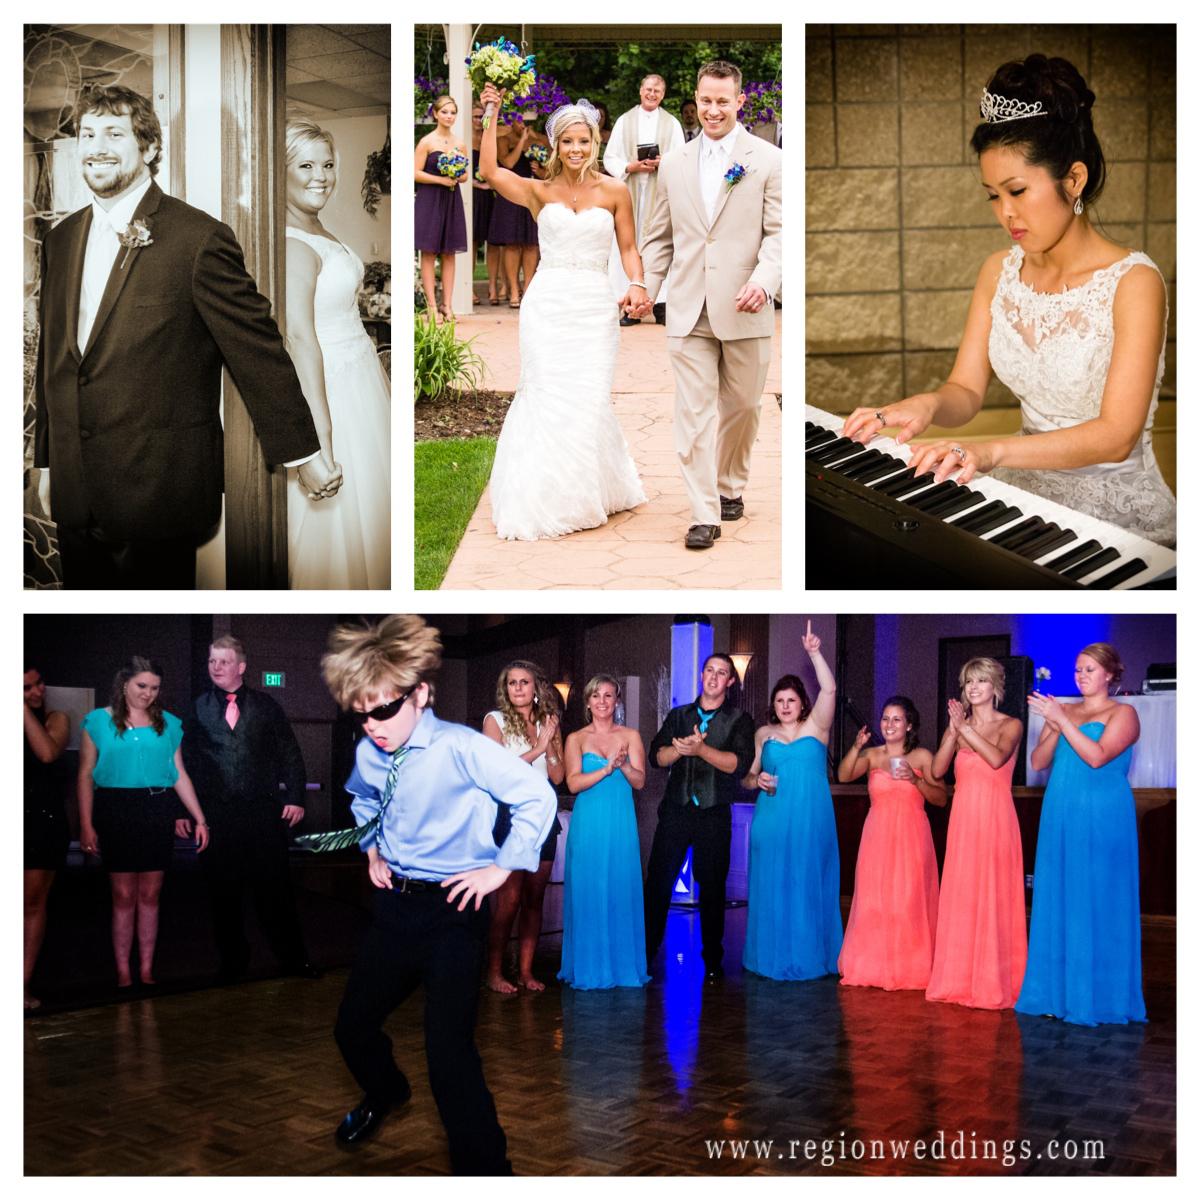 fun-wedding-moments-collage.jpg